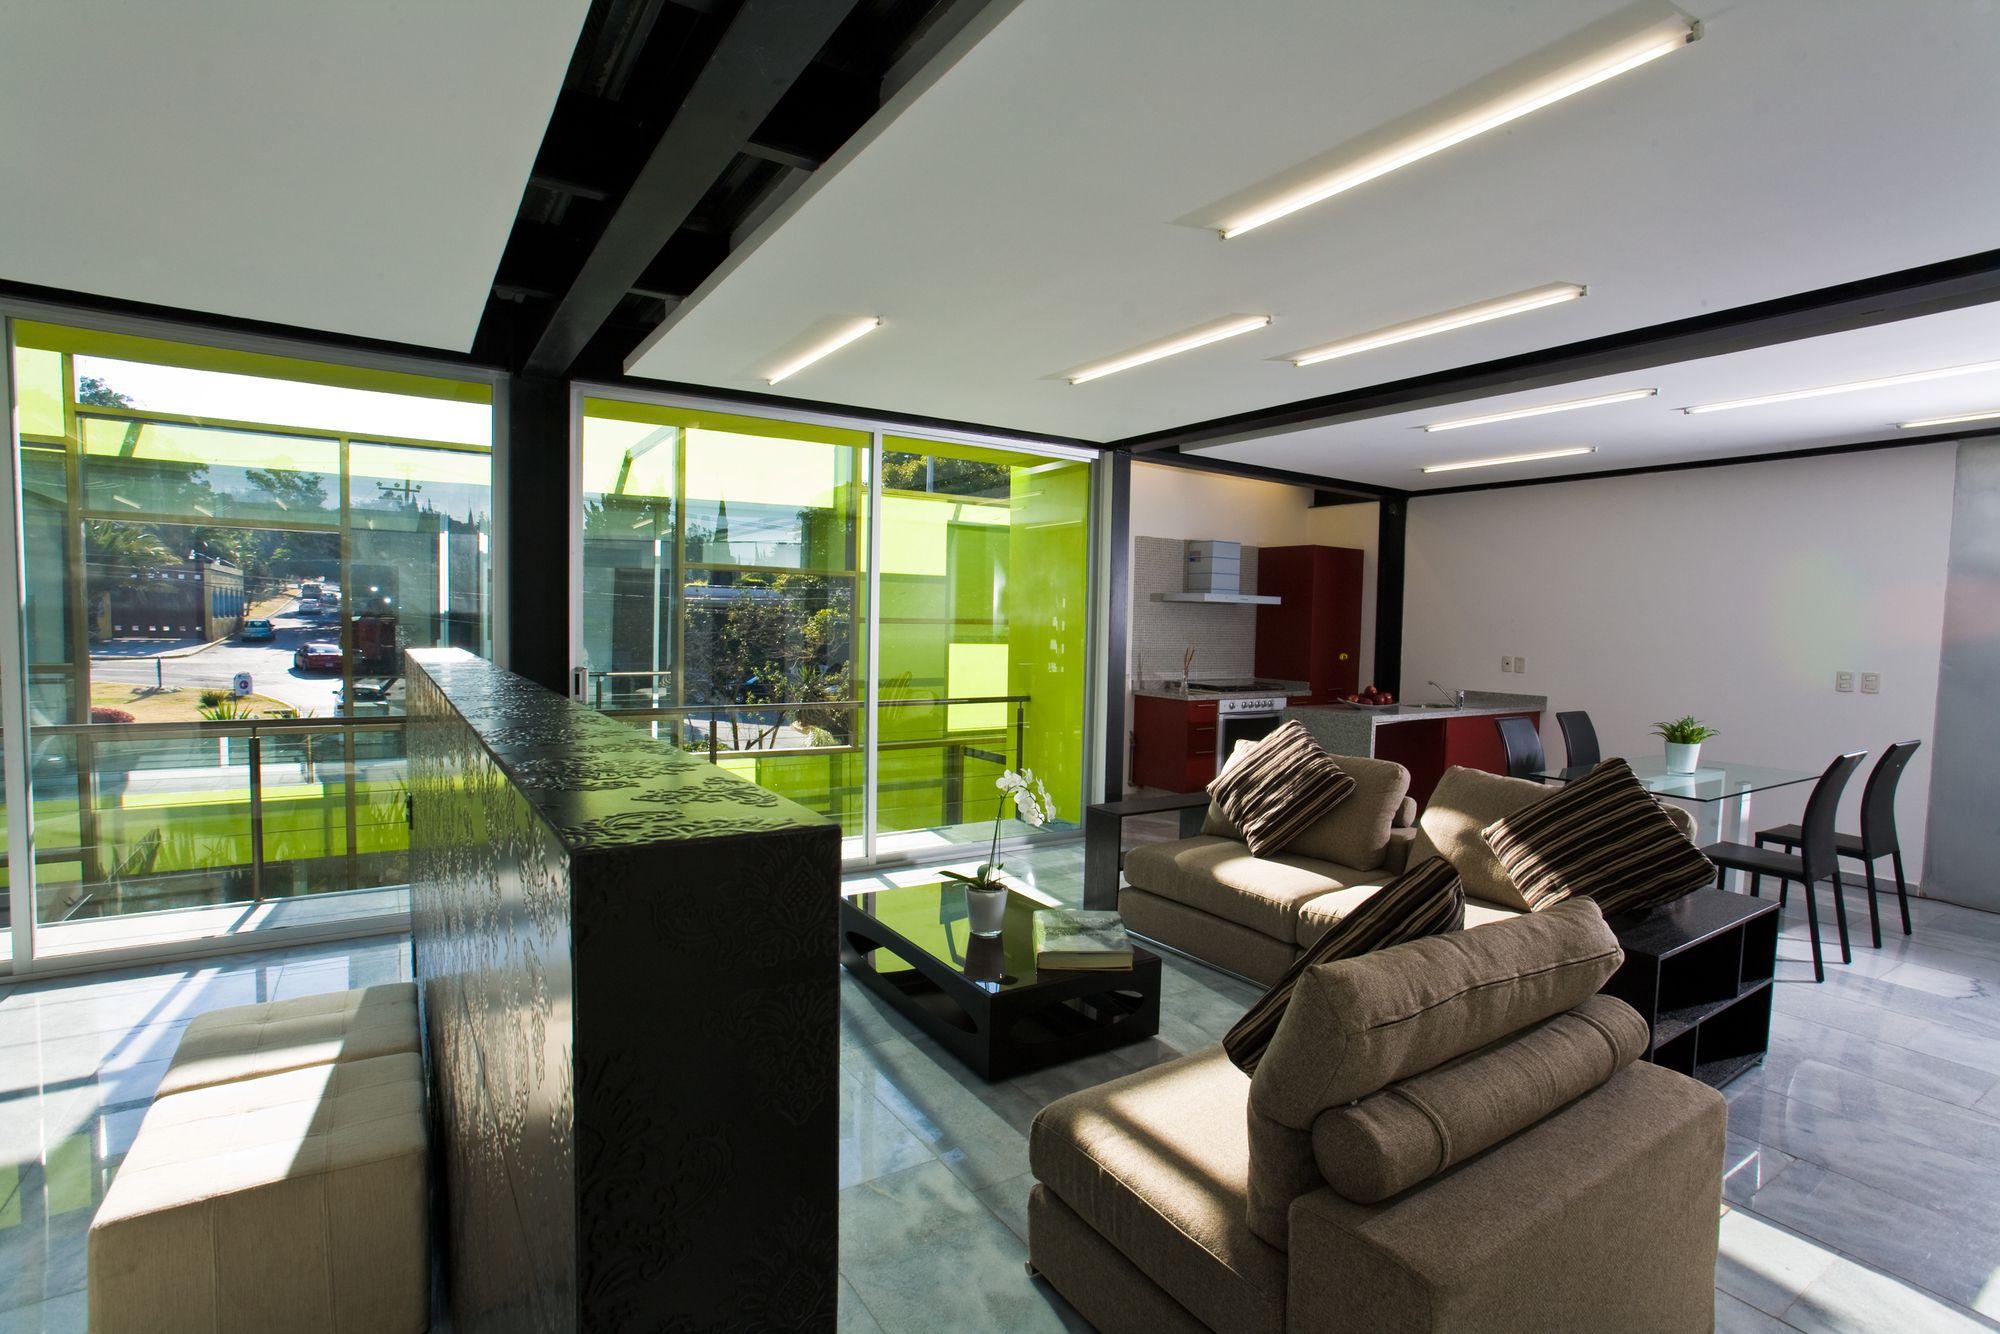 51a8dafcb3fc4b9027000458_trevox-223-craft-arquitectos_18